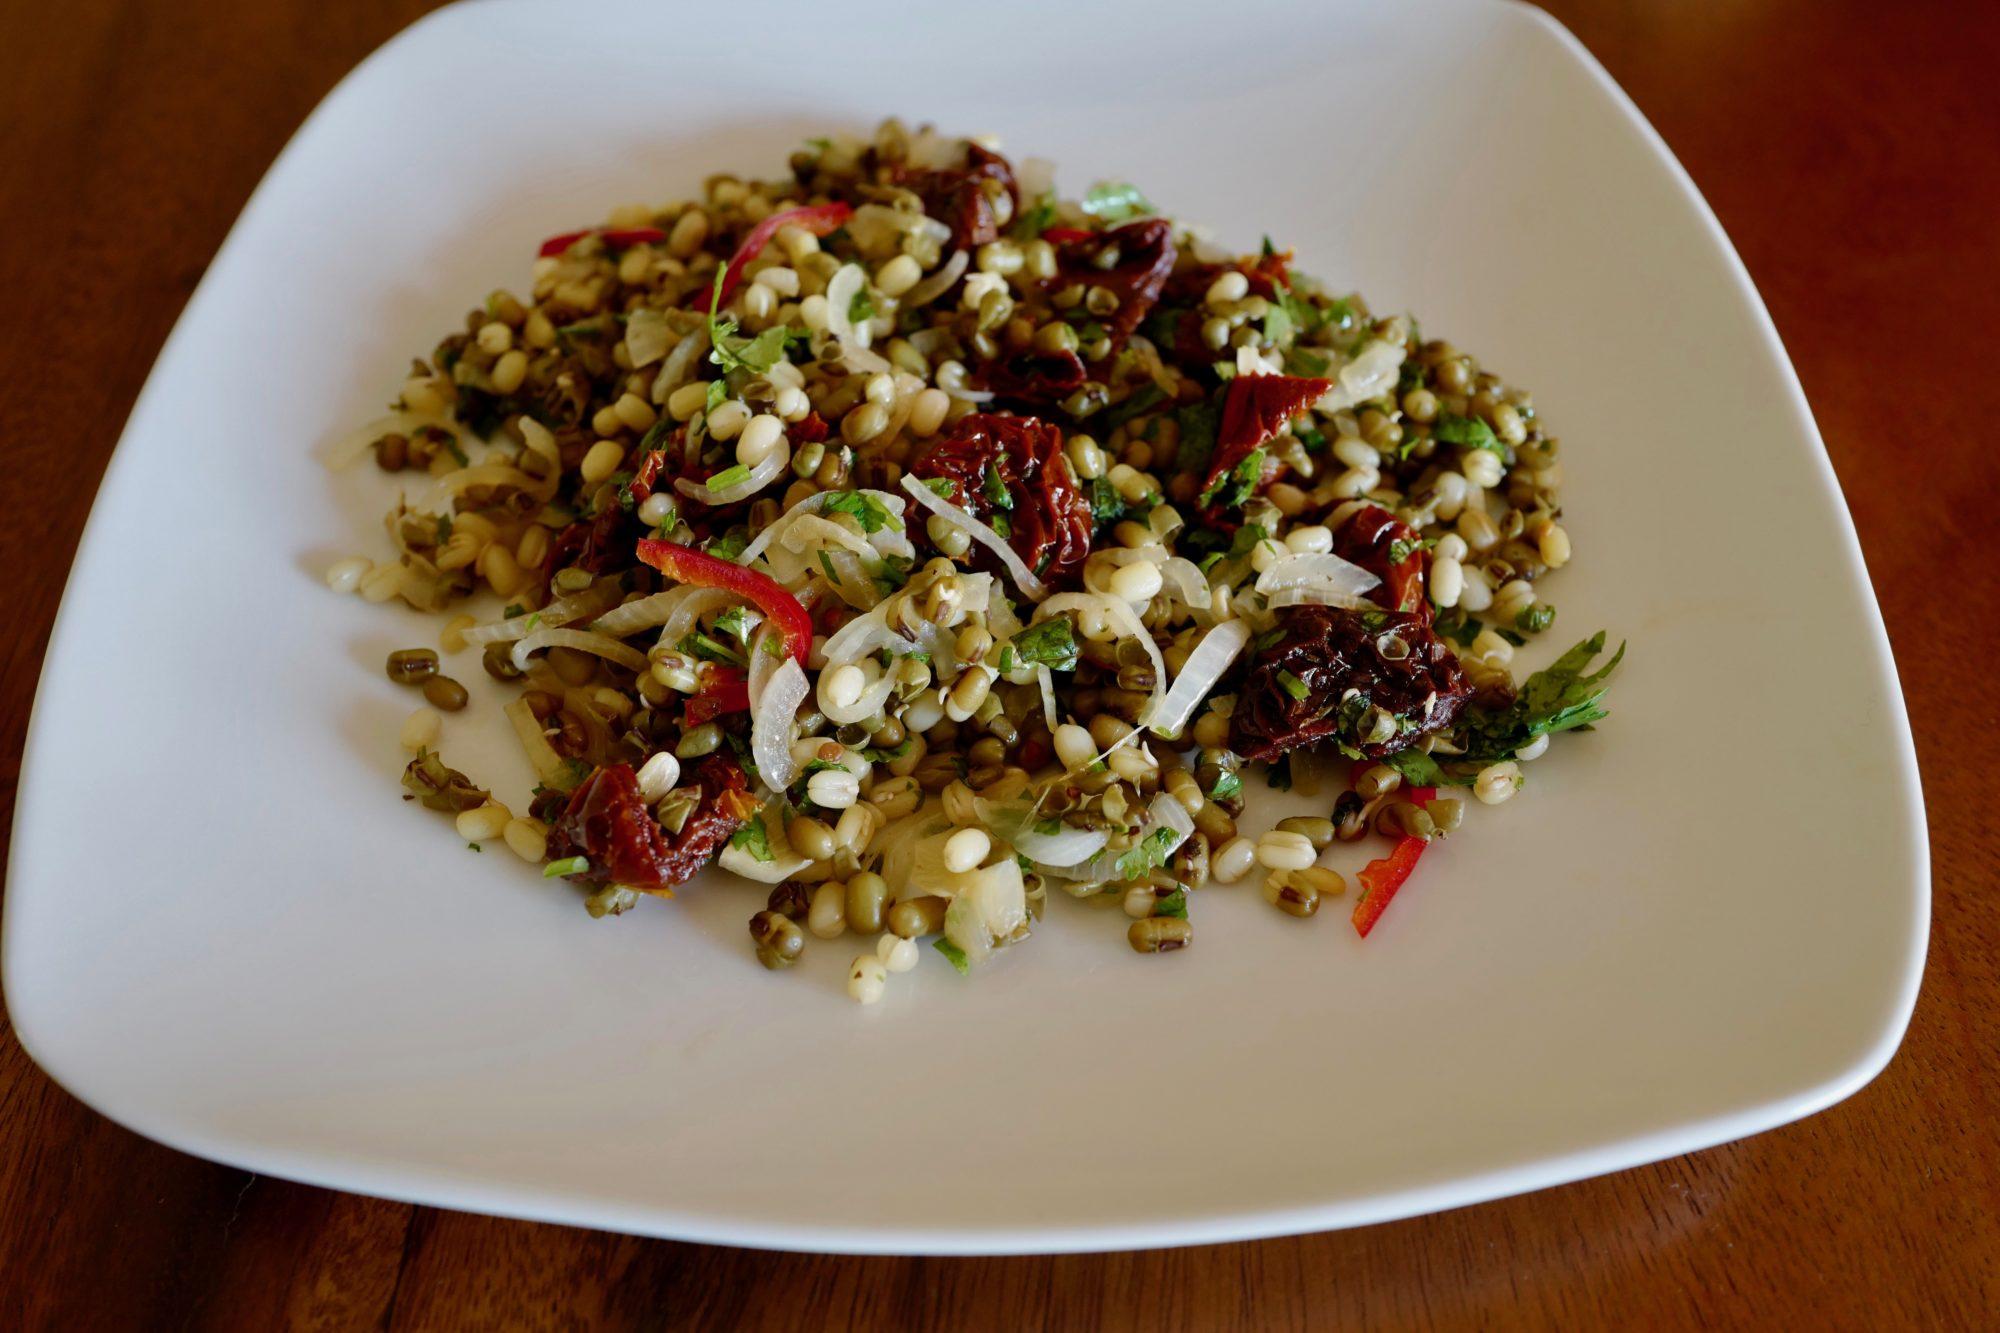 Mung bean salad with sun-dried tomatoes gluten-free vegan by Foodjoya